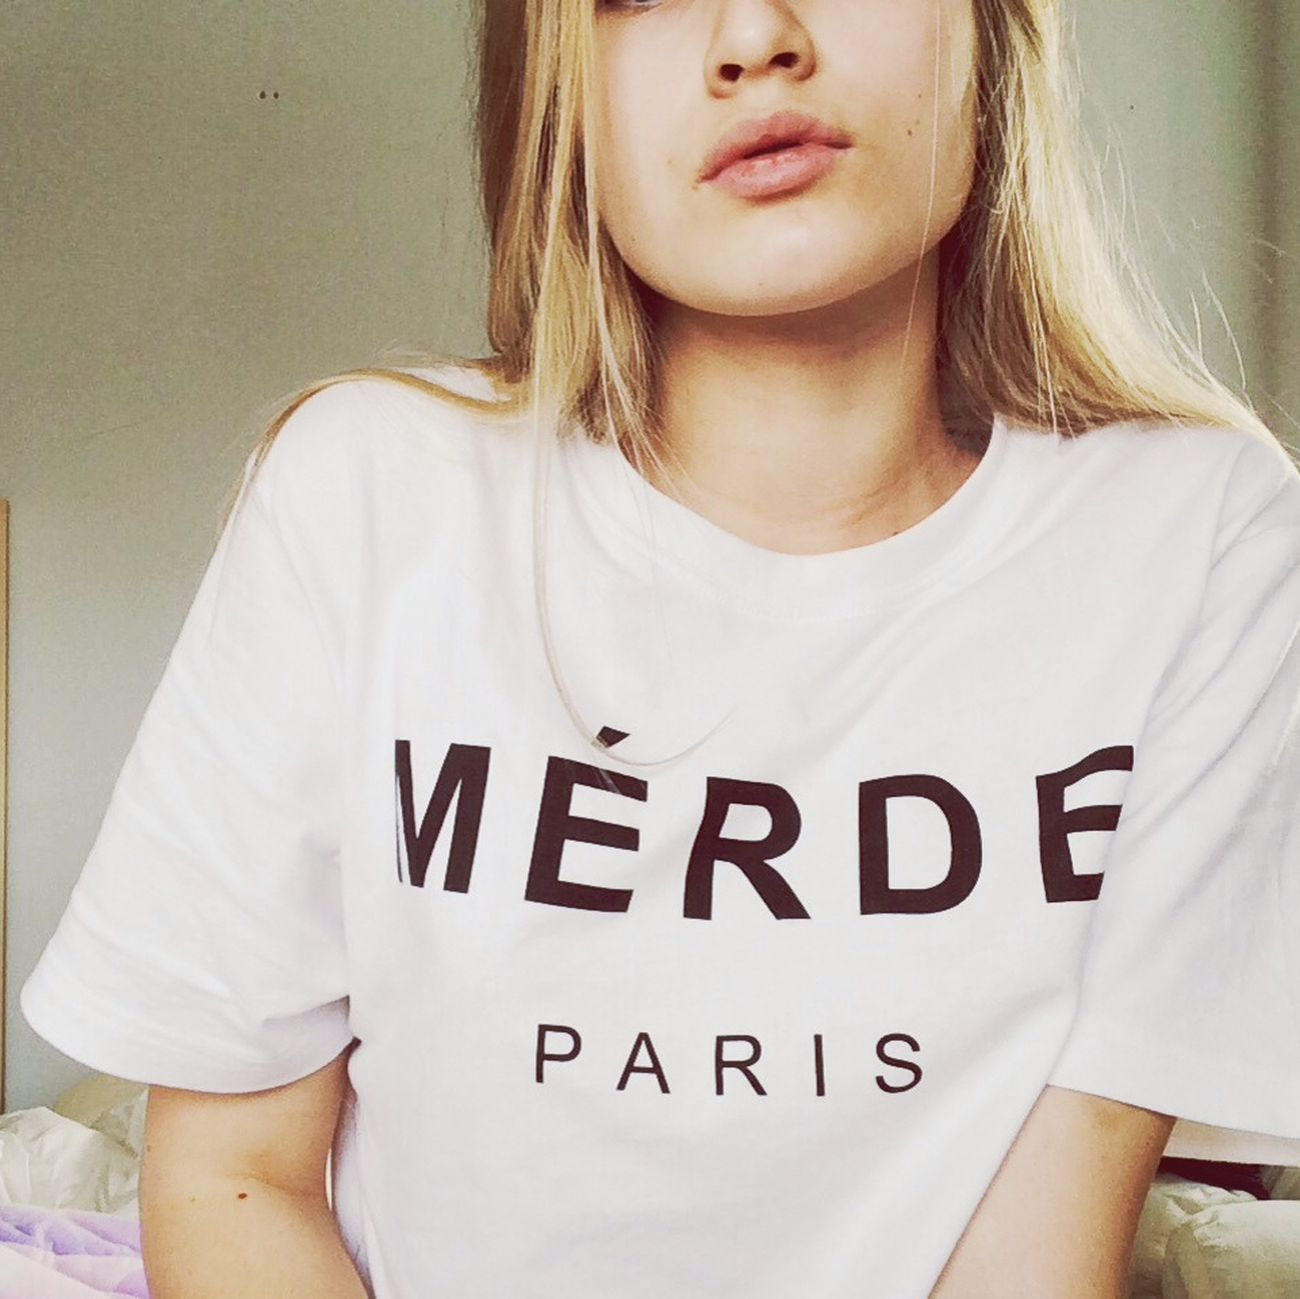 Merde Paris Fashion Snipes